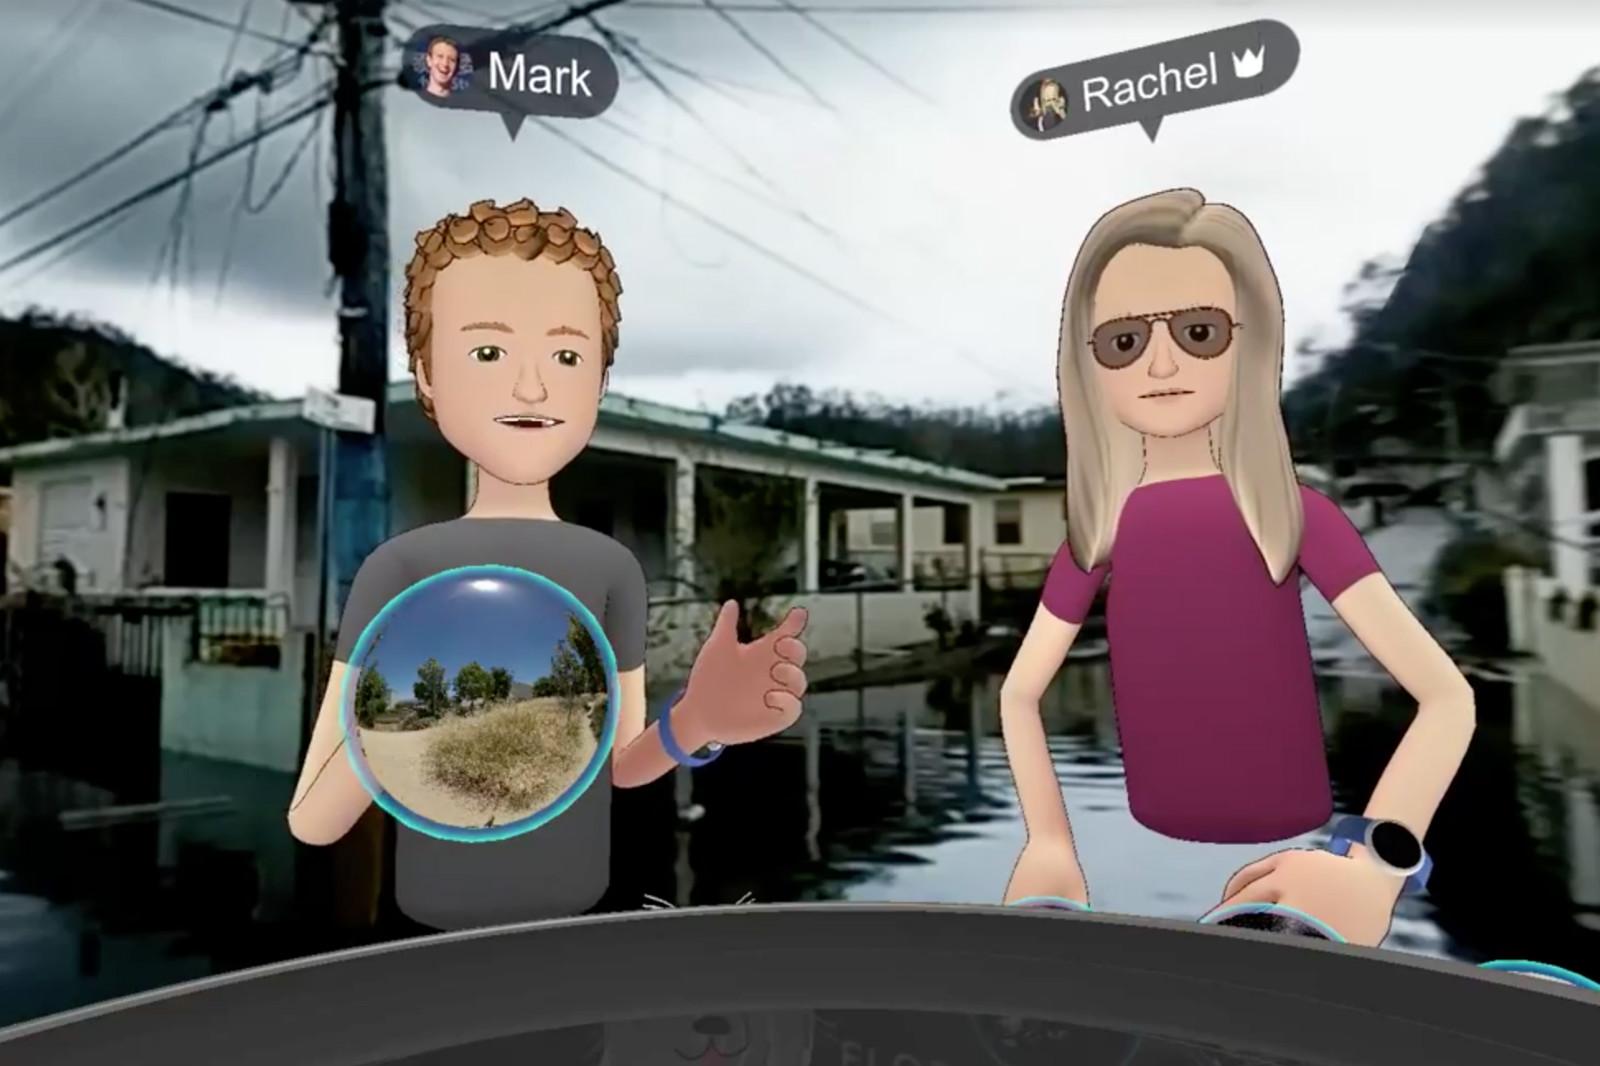 Mark Zuckerberg uses Facebook to visit Puerto Rico in VR